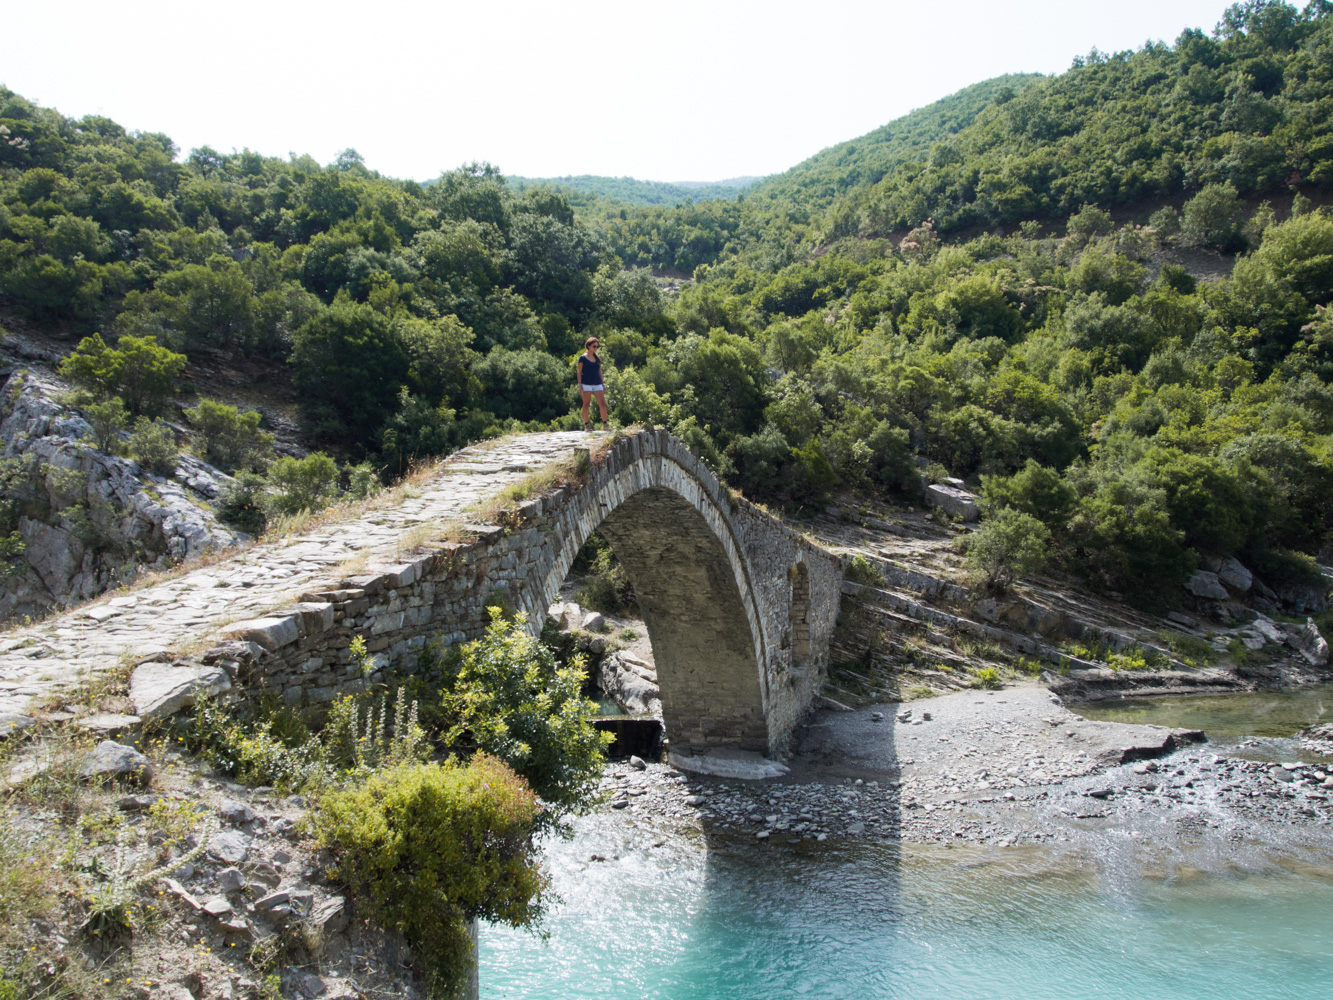 albania_permet_viosa-1-of-1-3